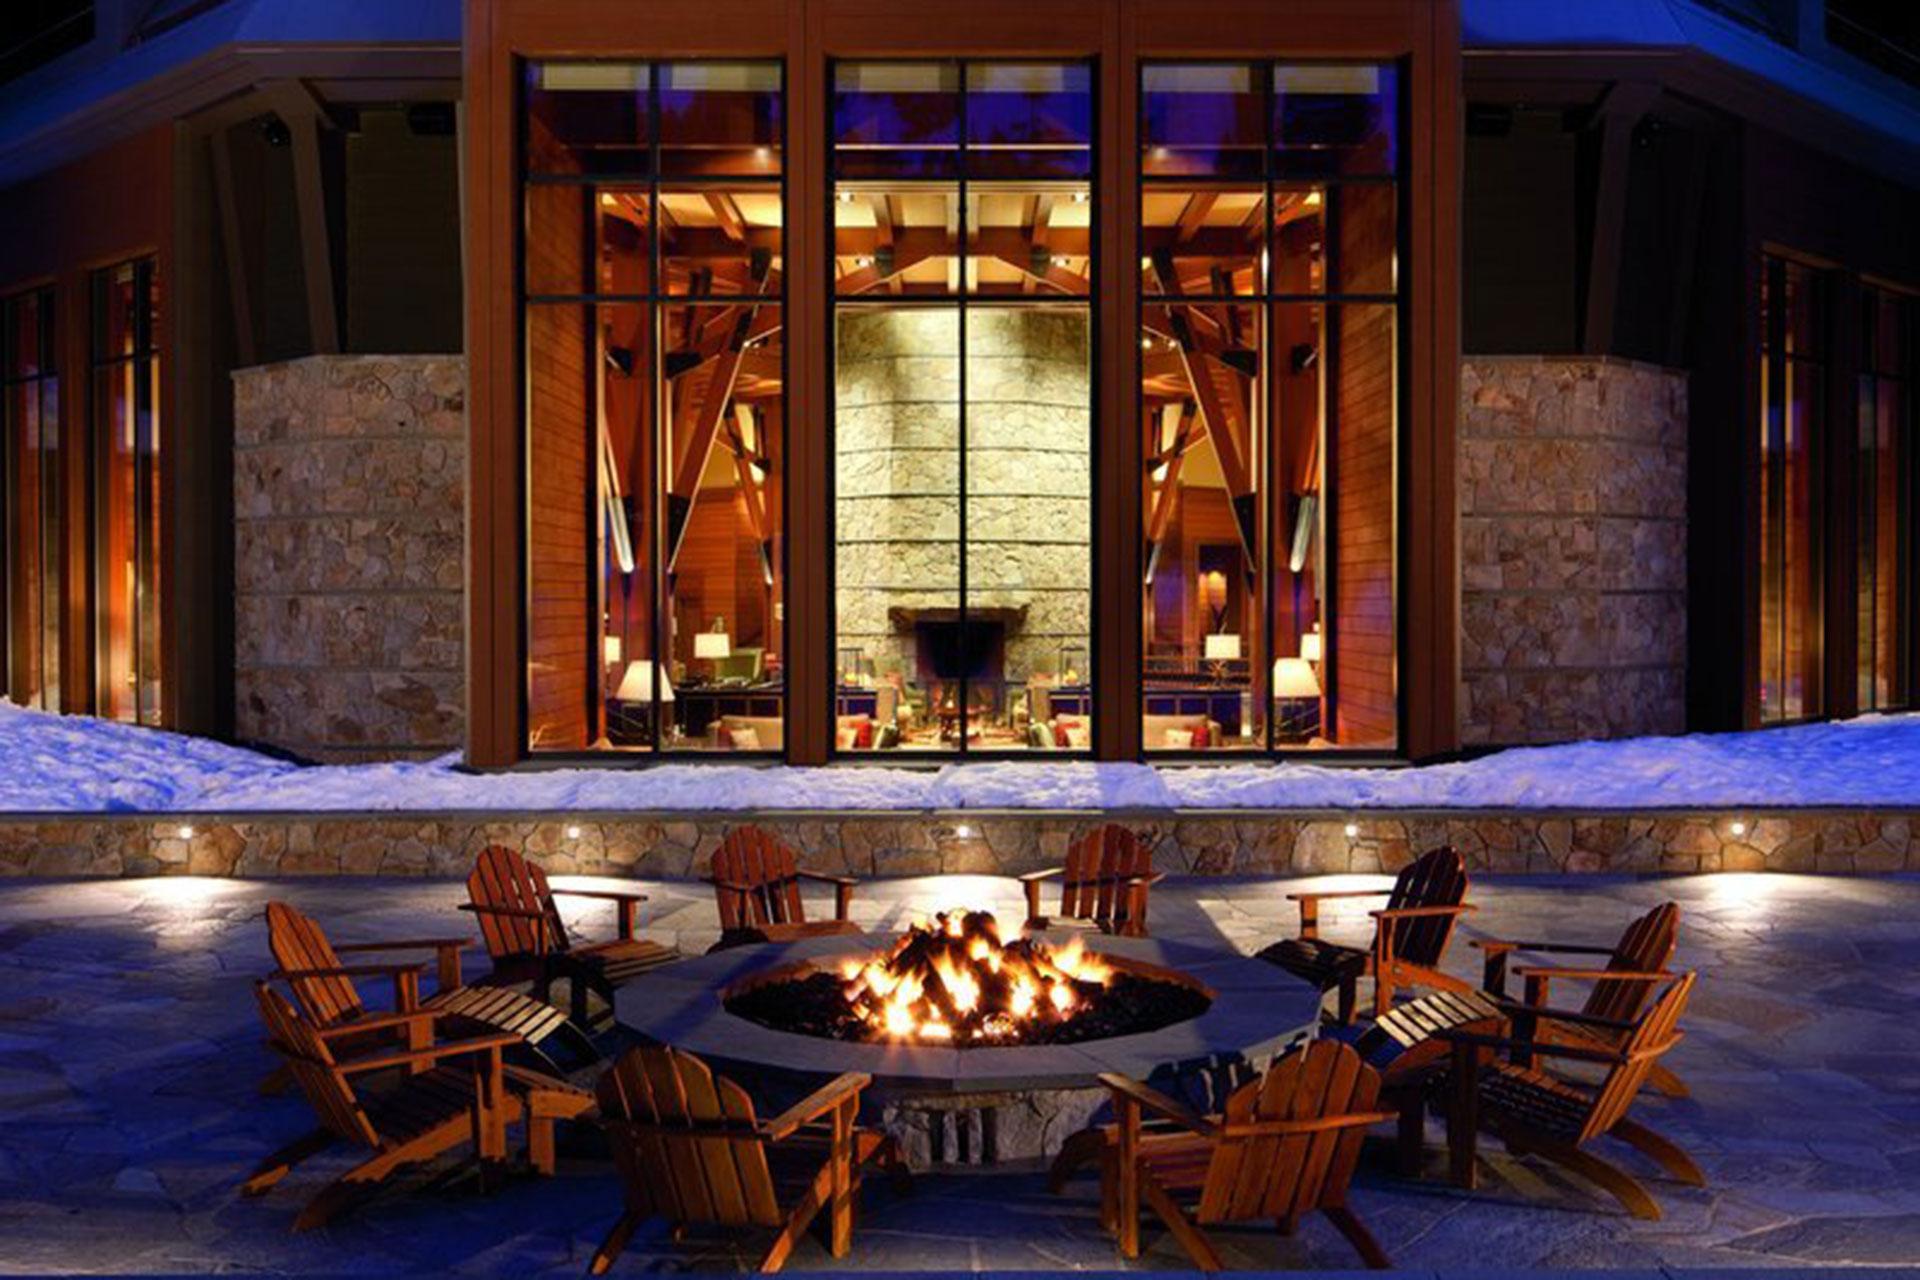 Fire Pit at The Ritz-Carlton, Lake Tahoe; Courtesy of The Ritz-Carlton Lake Tahoe